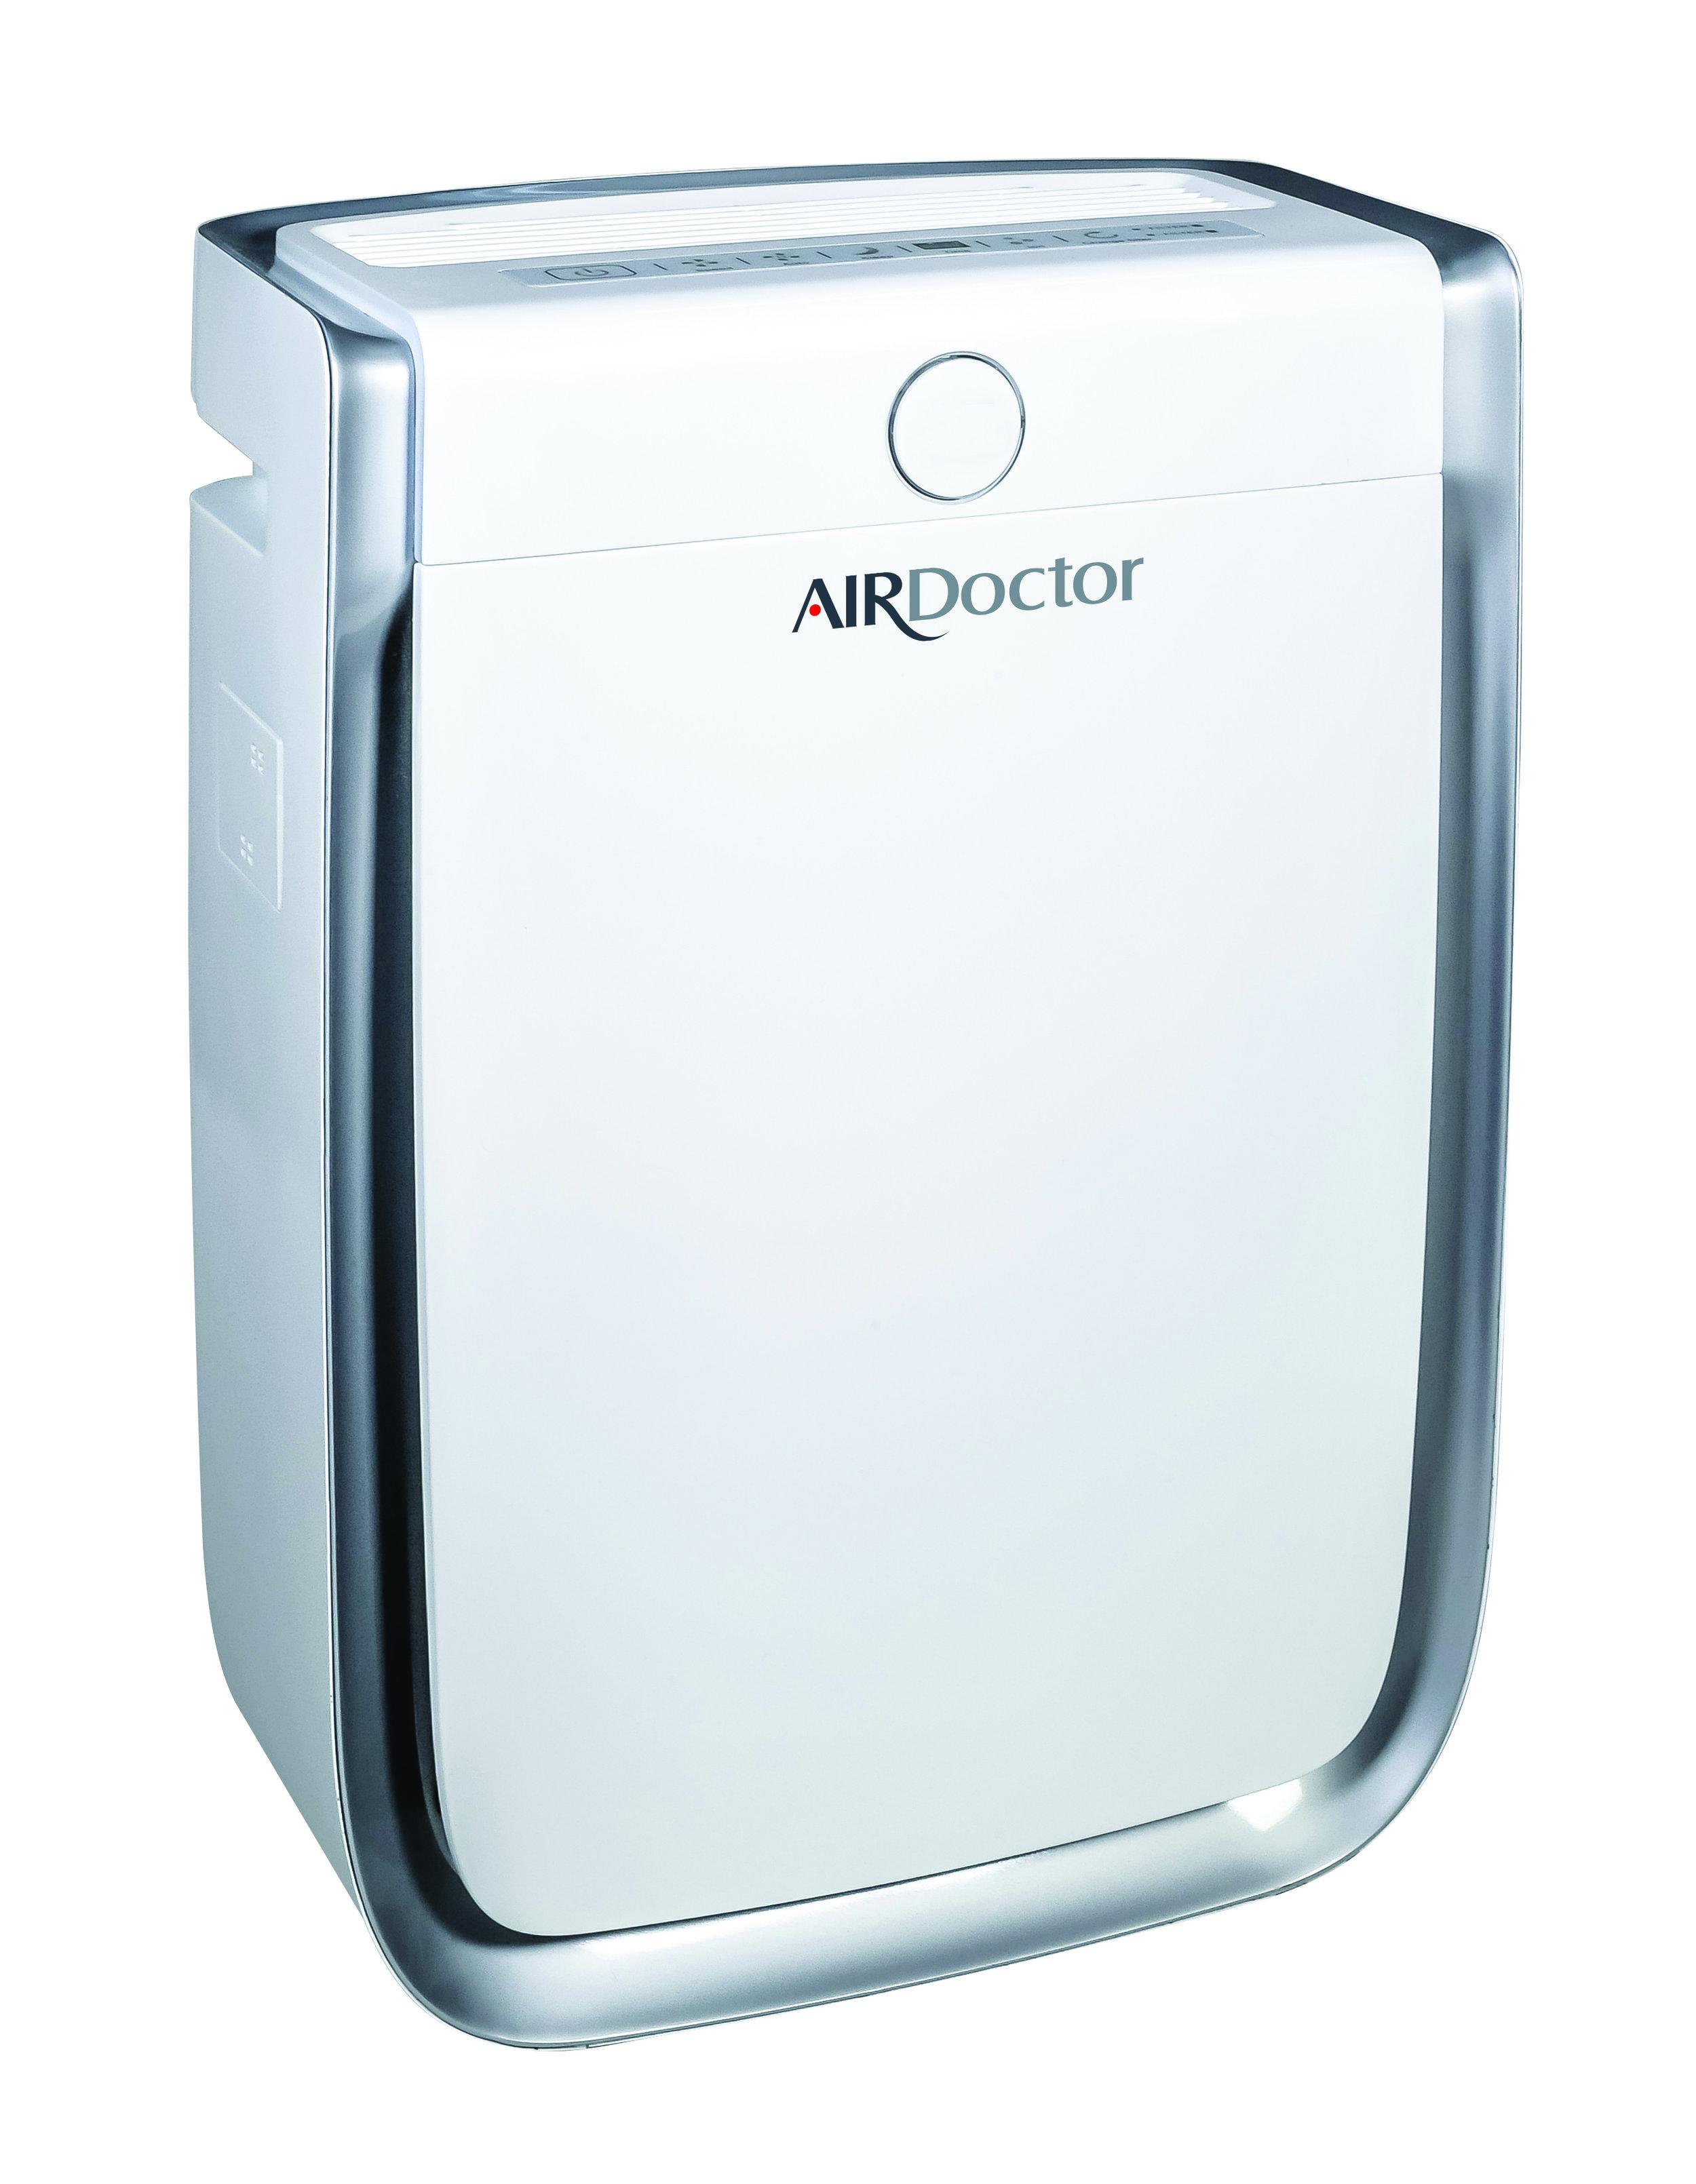 AirDoctor_LogoGREY-6993_OnWht.jpg